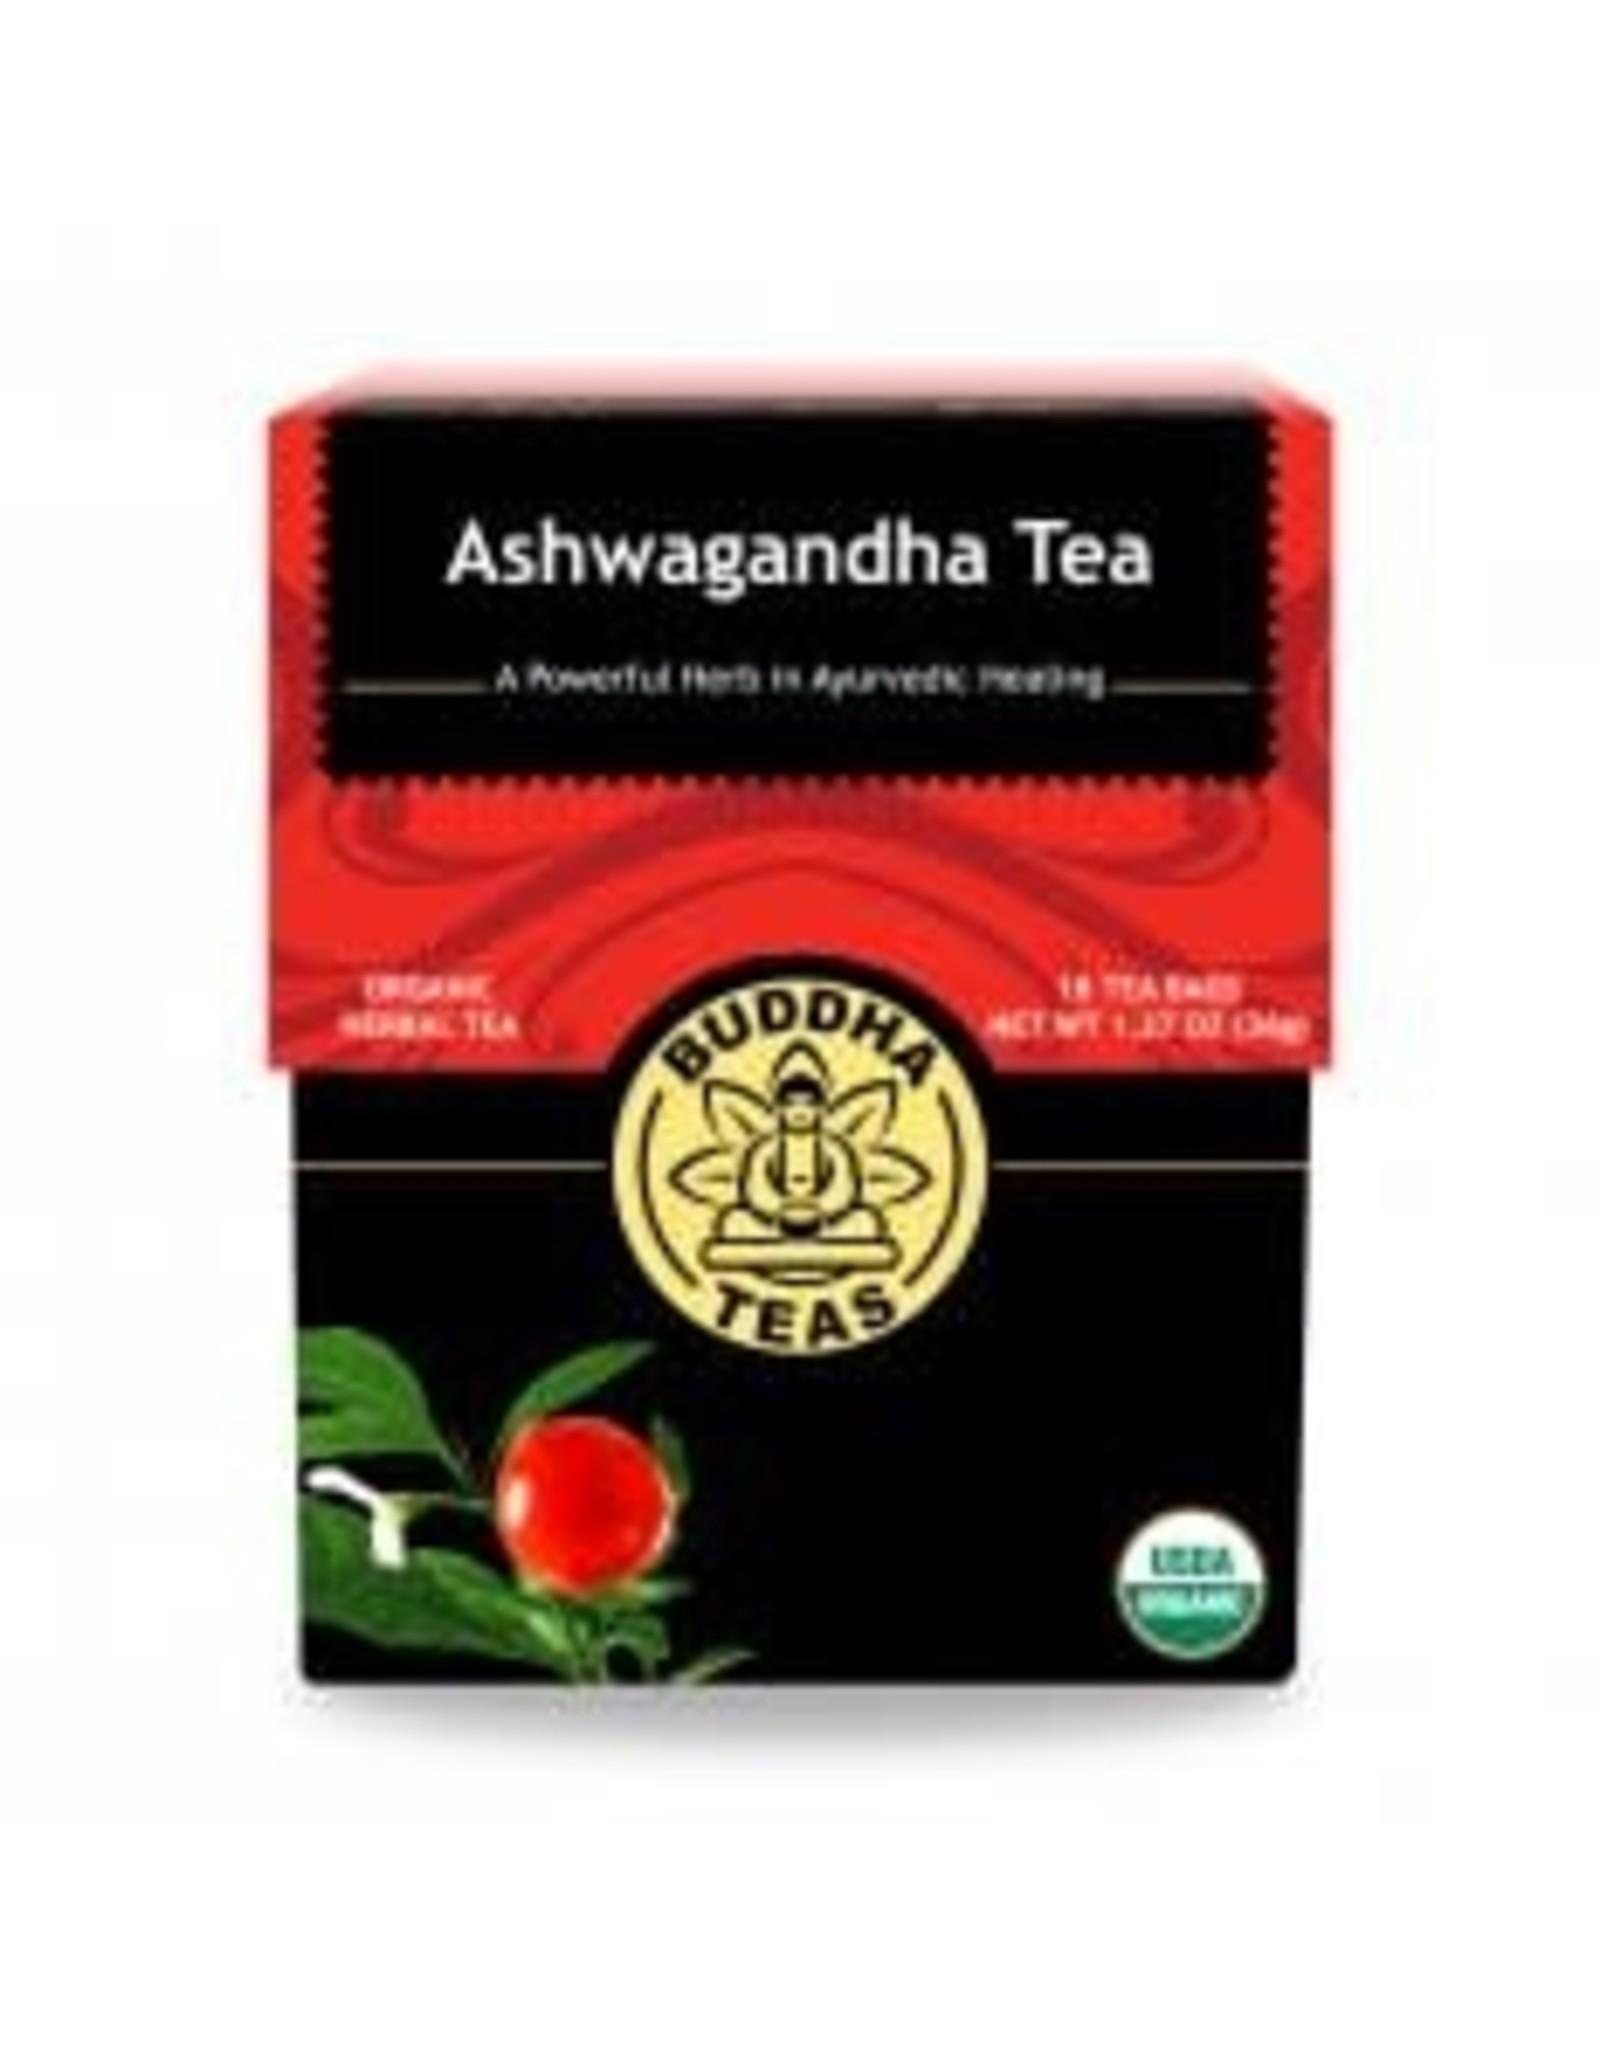 Buddha Teas Ashwagandha Tea x 18 Tea Bags